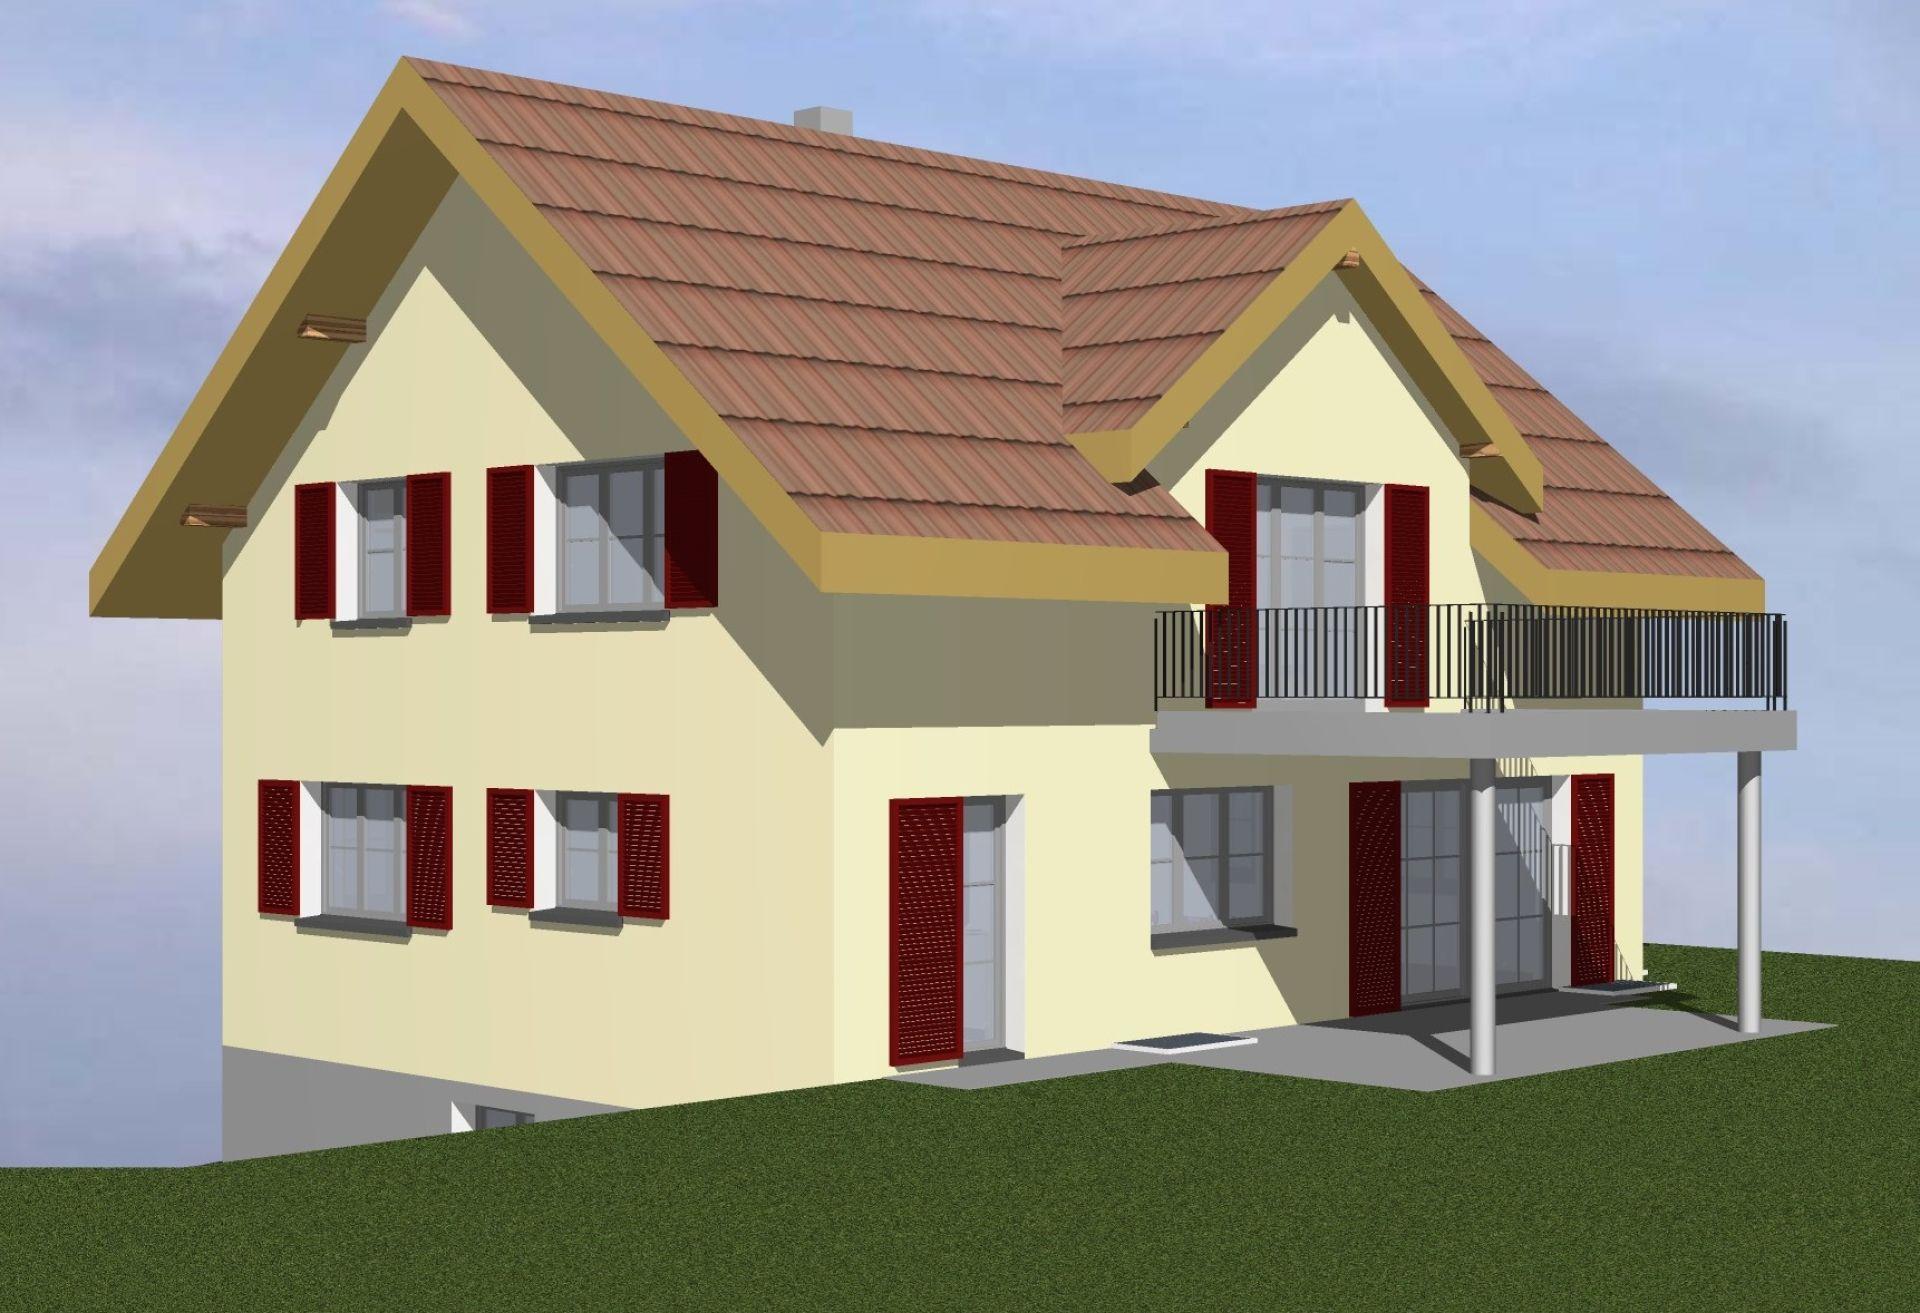 Miete: Einfamilienhaus an ruhiger Lage